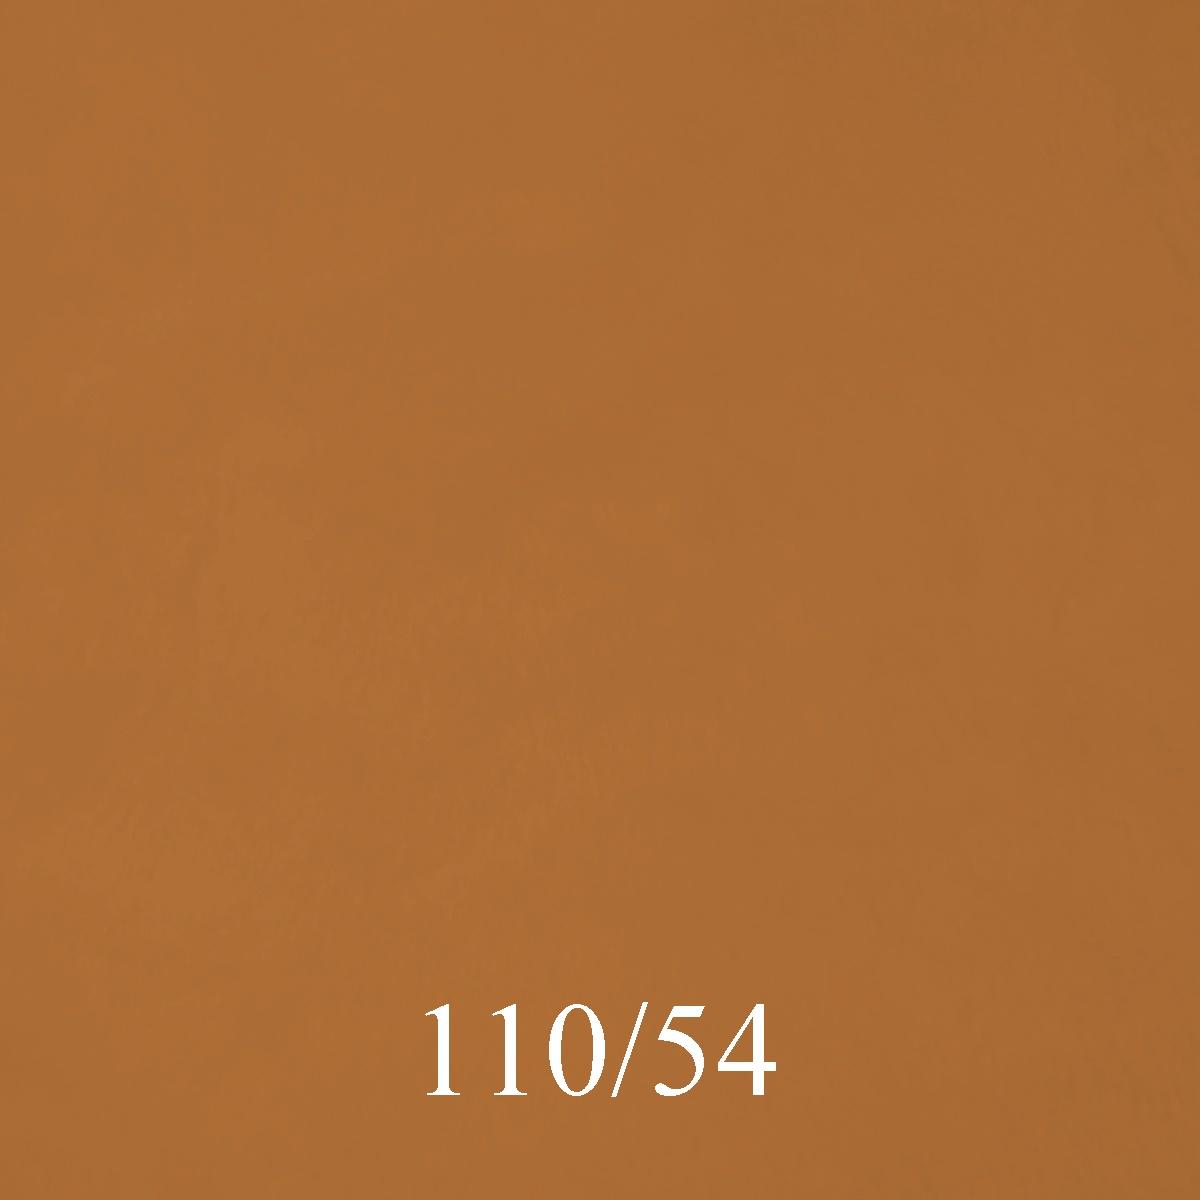 110-54 Tabaco